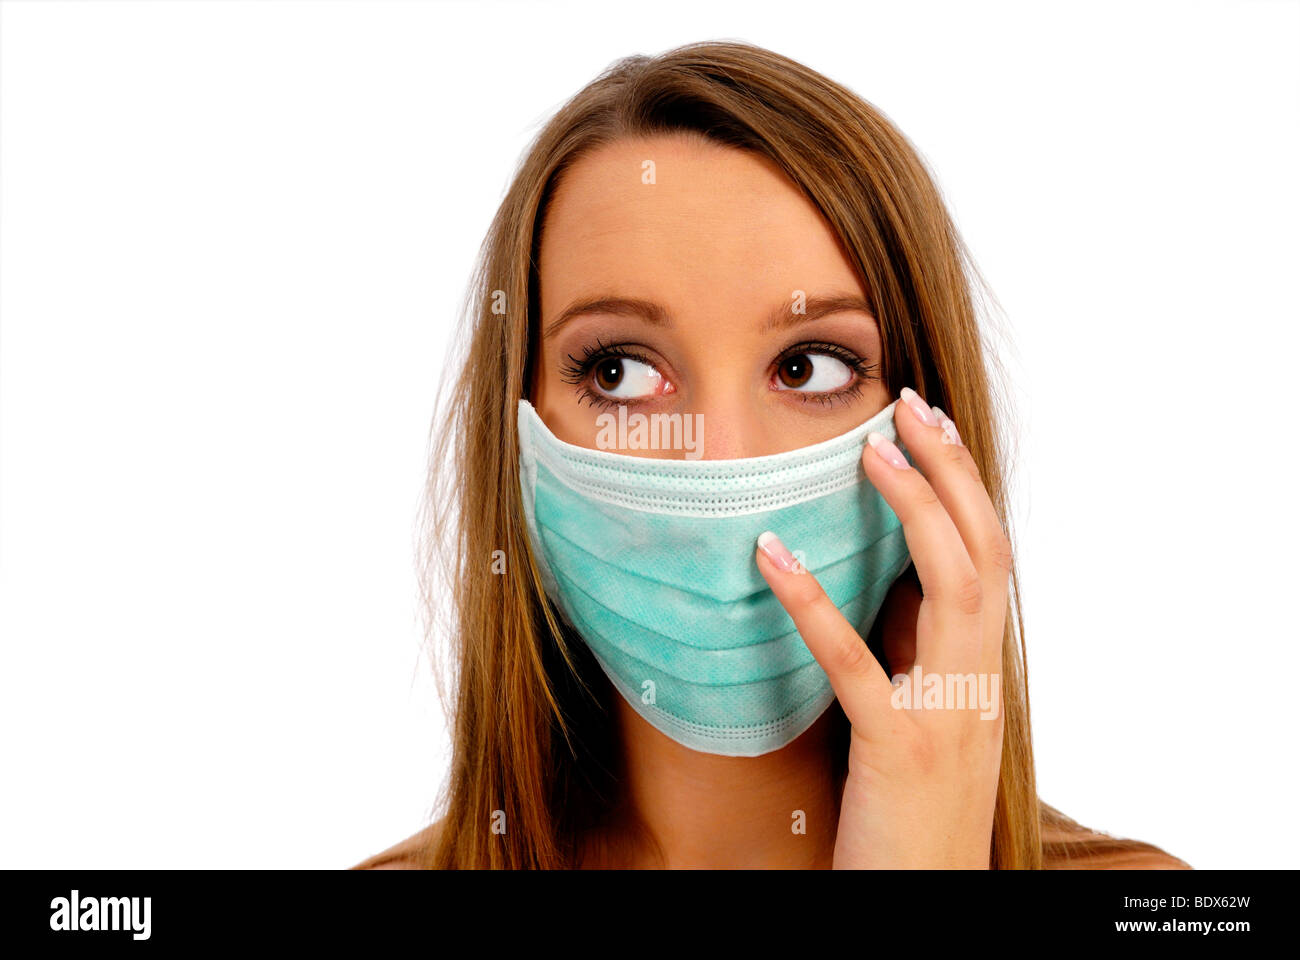 Woman with face mask, swine flu, flu viruses Stock Photo